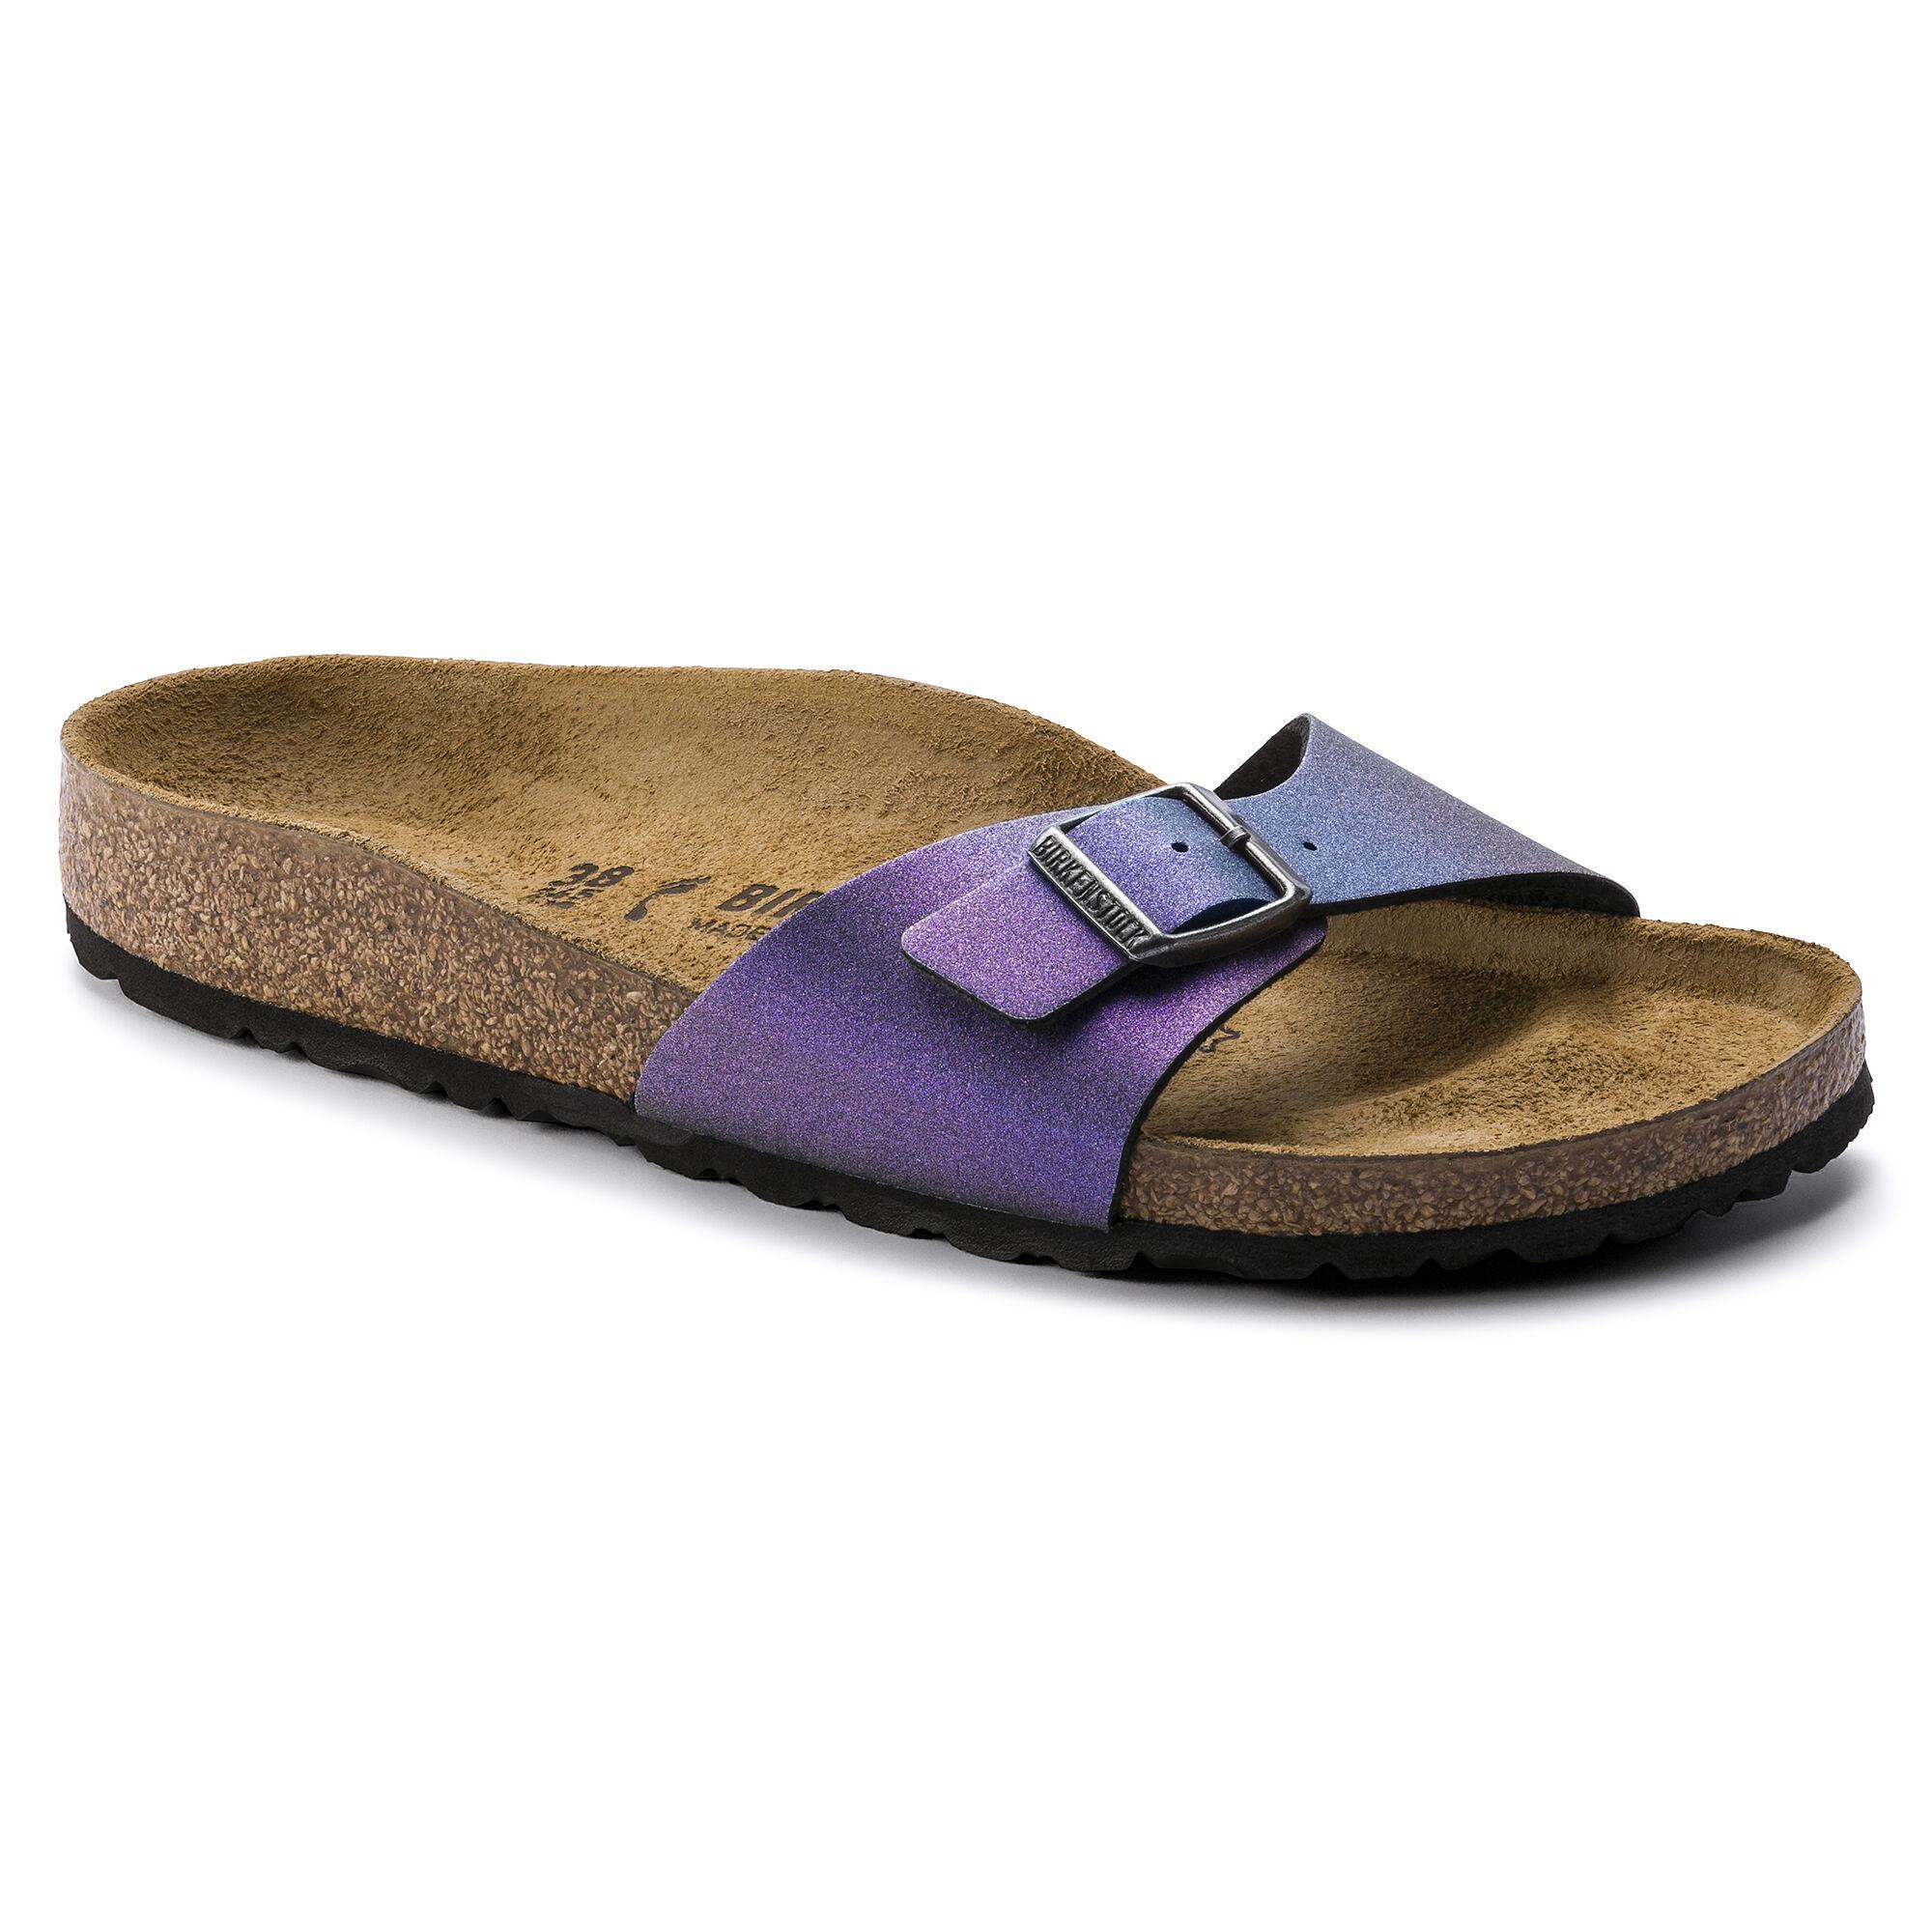 Purple Birkenstock Zurich Stores Fitting Guide | Portal for